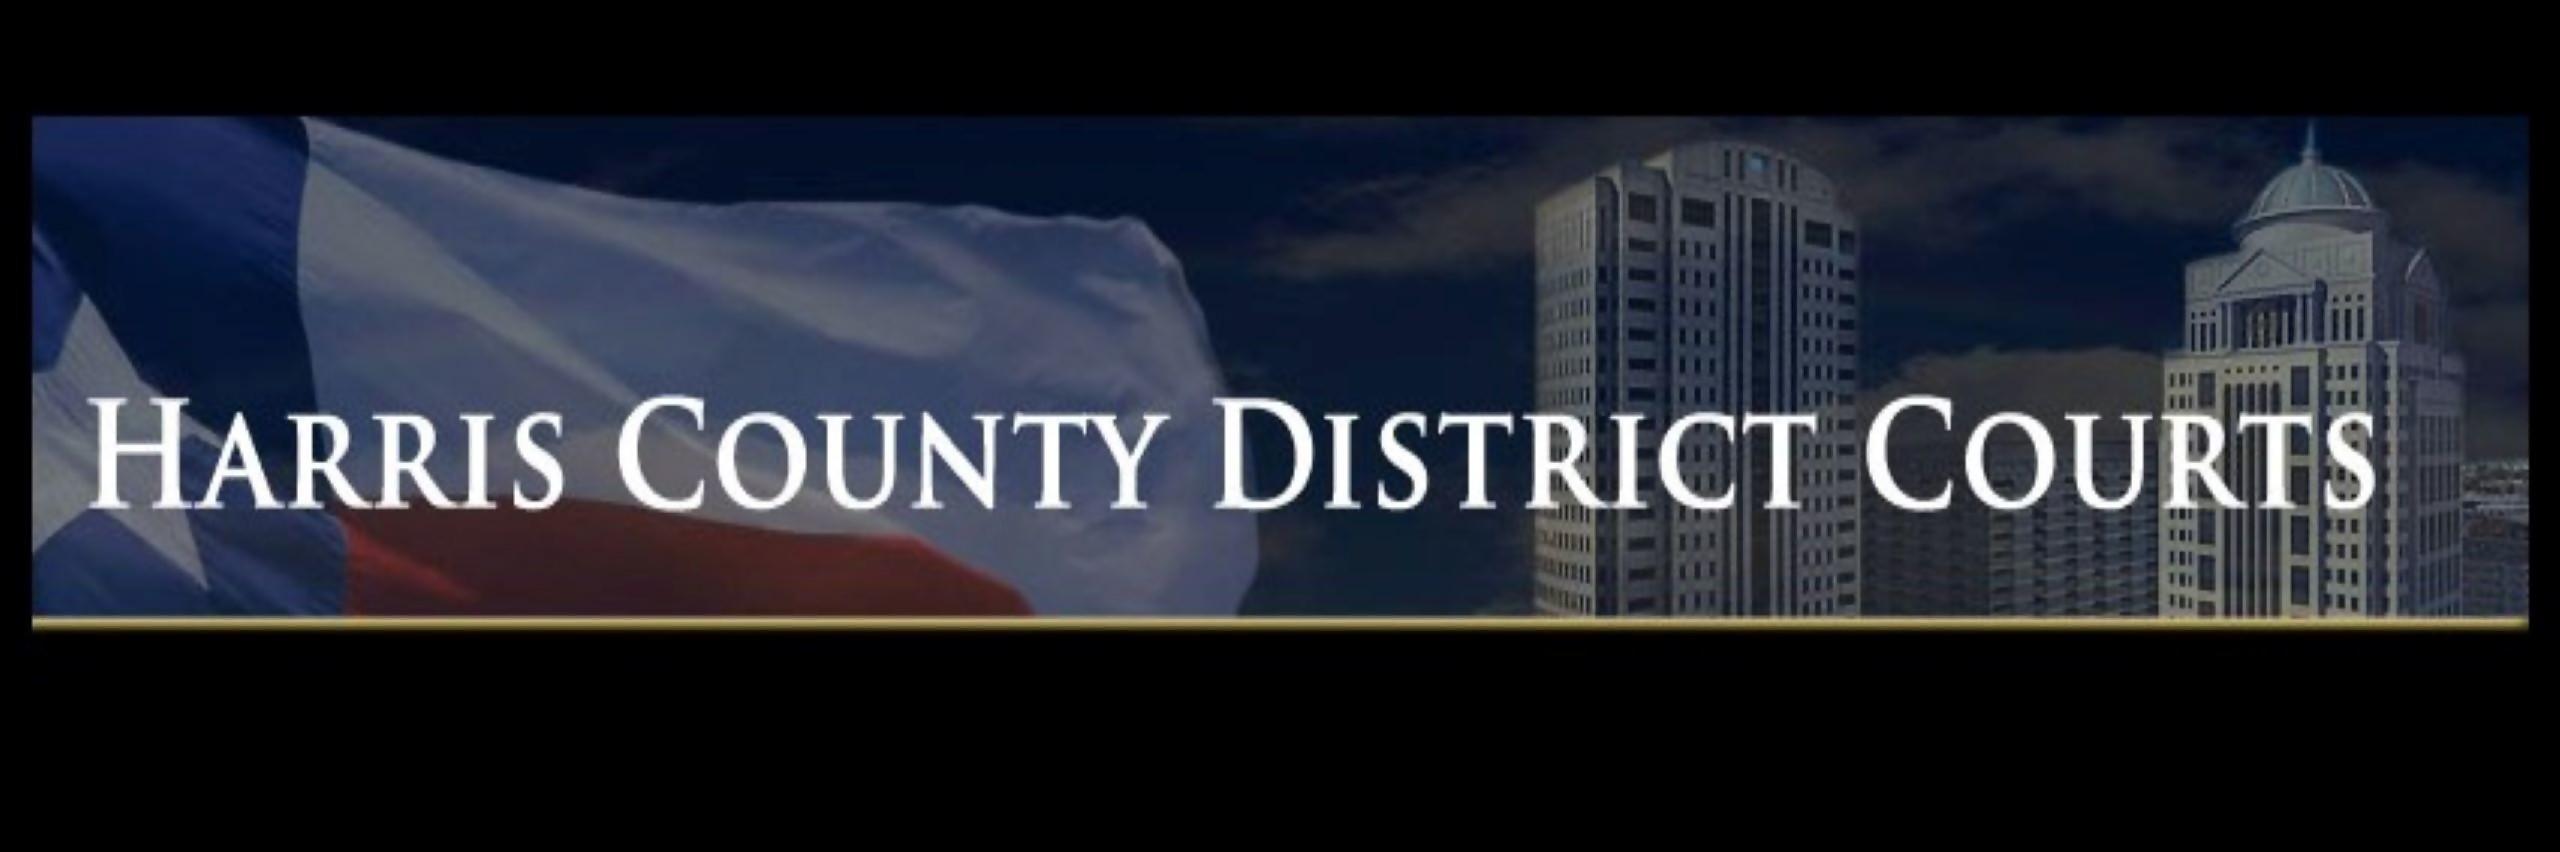 262nd District Court - Live Stream